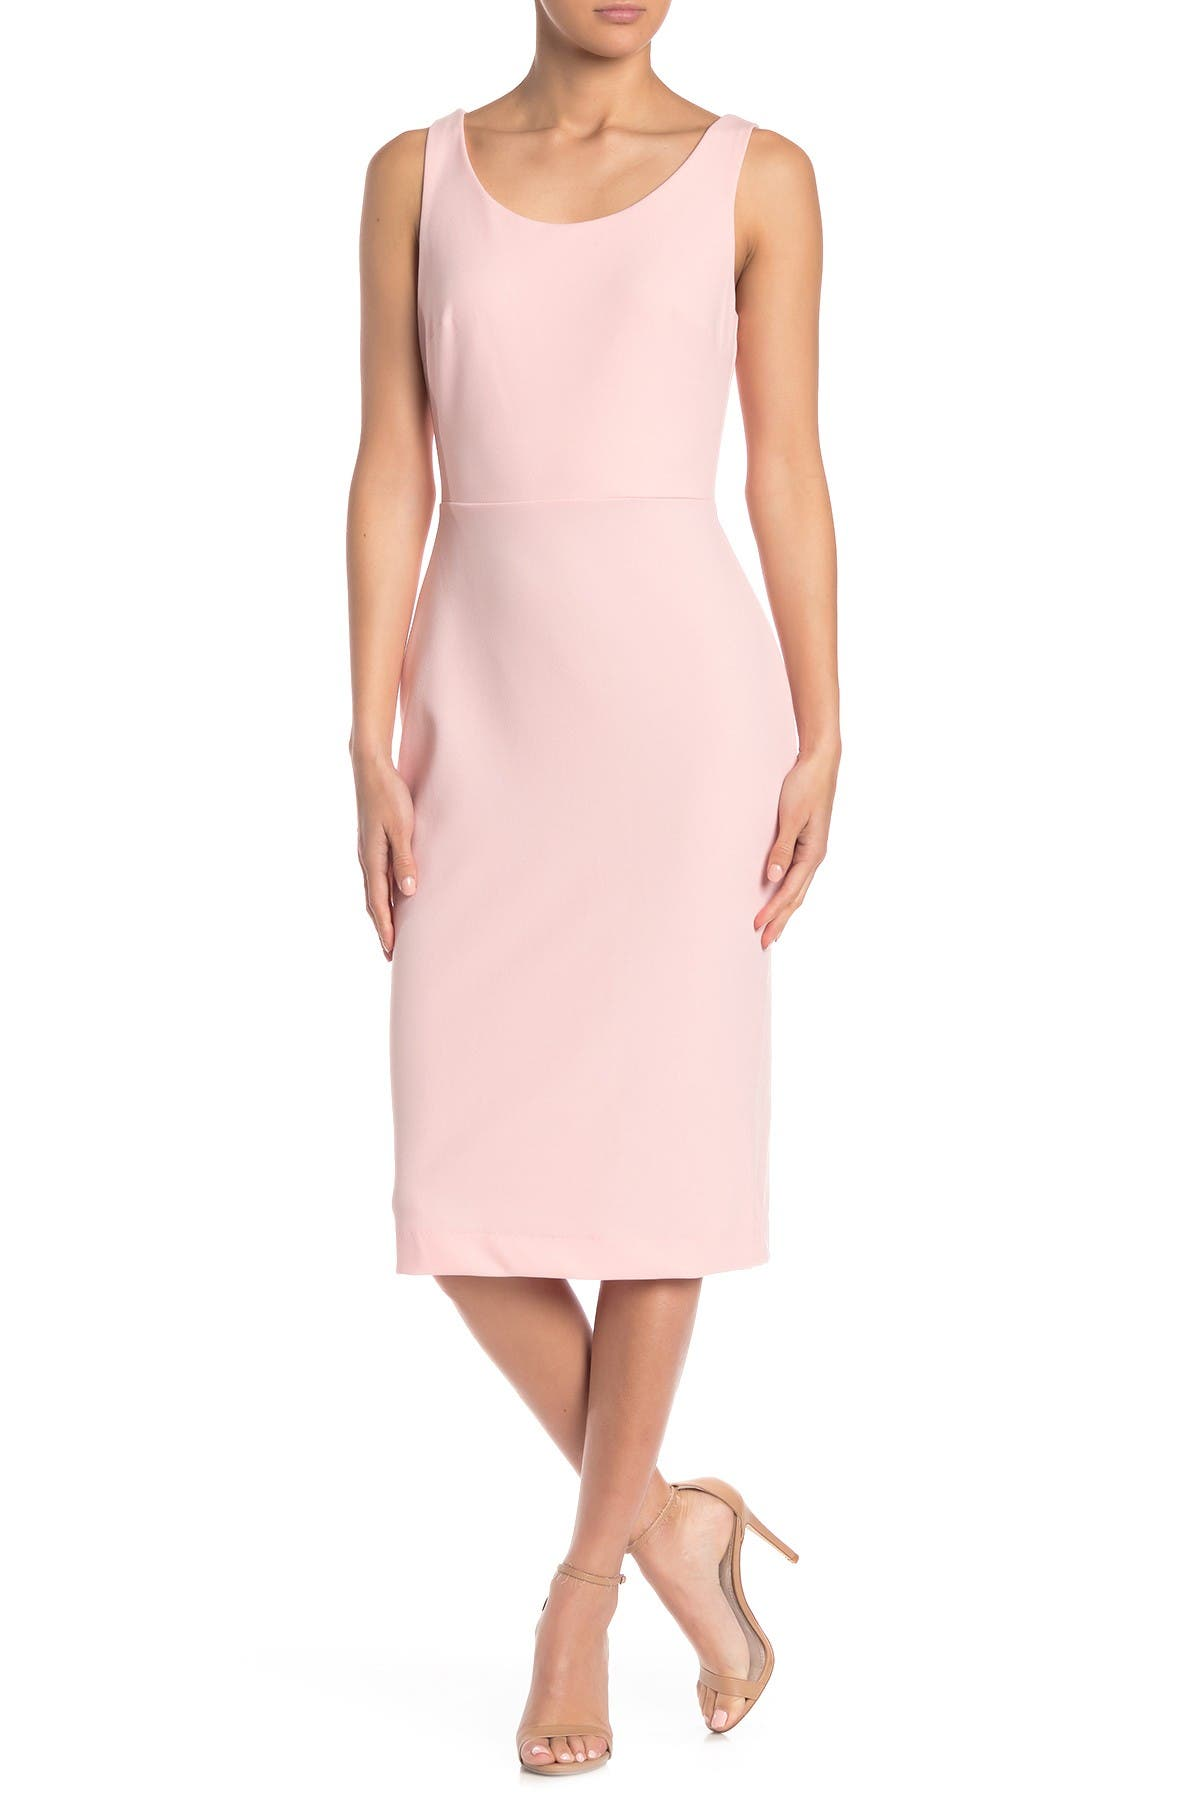 Image of Betsey Johnson Scoop Neck Sleeveless Crepe Midi Dress